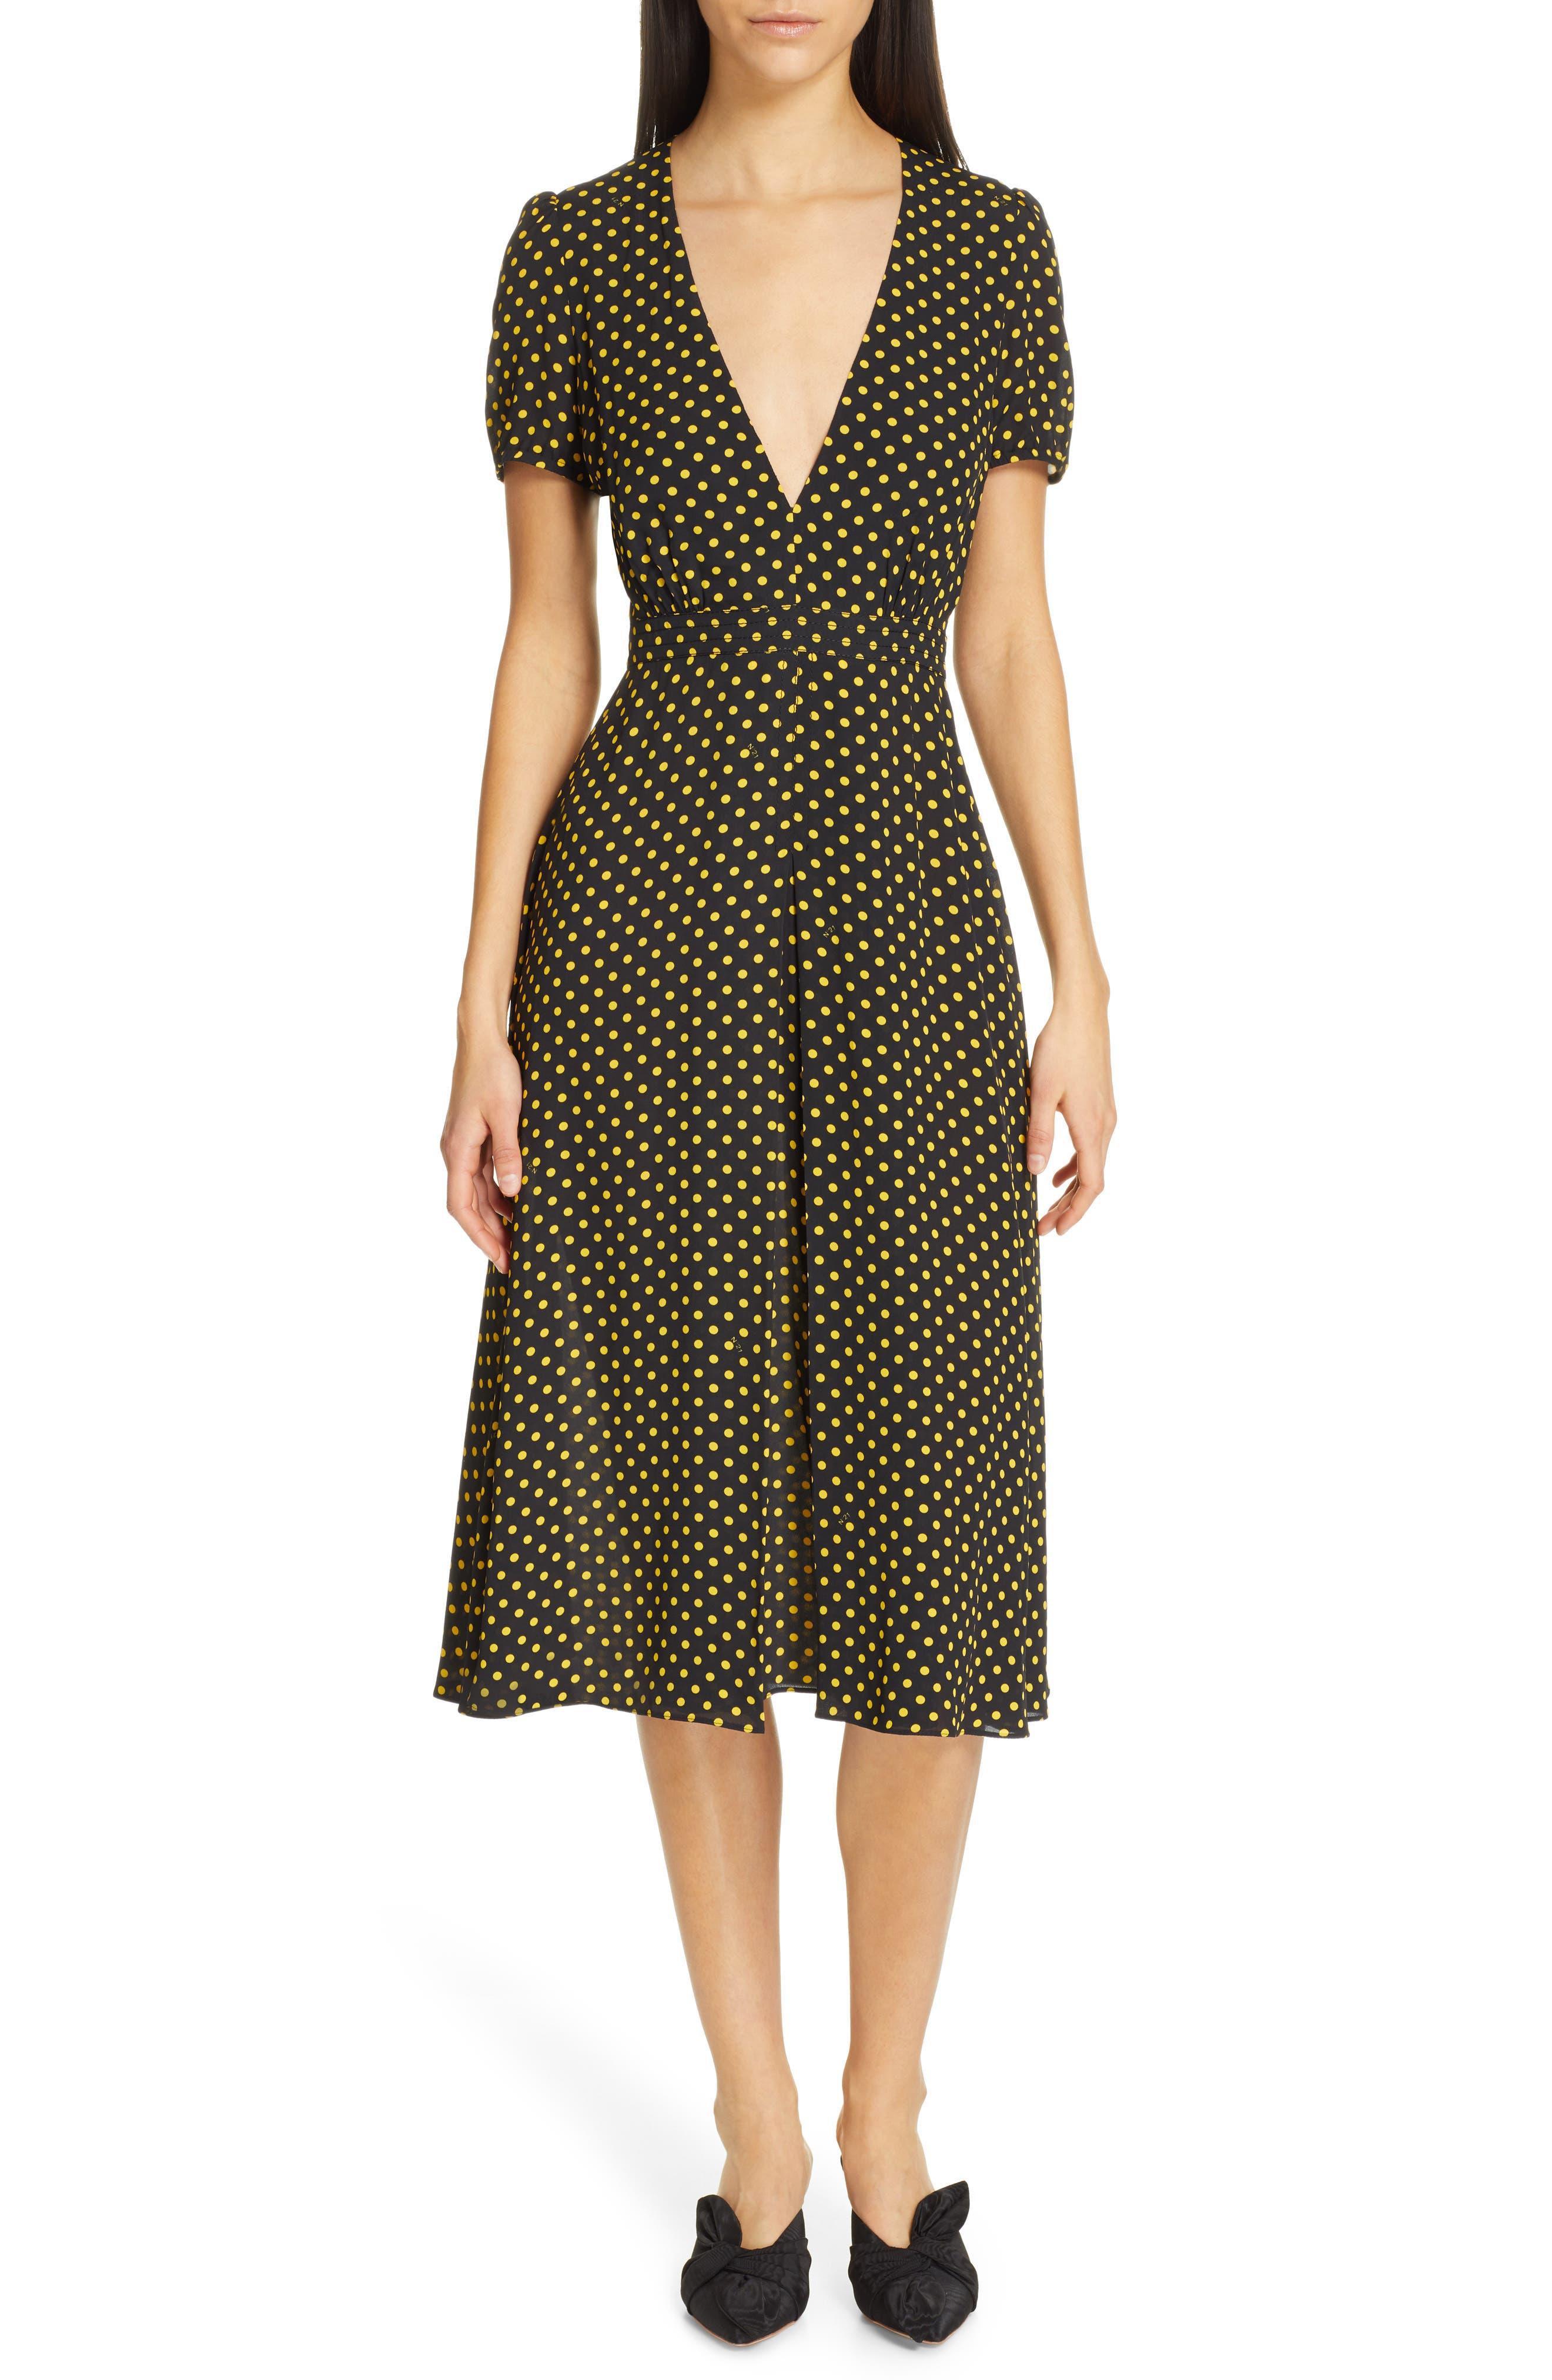 N°21 Dresses Nº21 Plunging Polka Dot Midi Dress